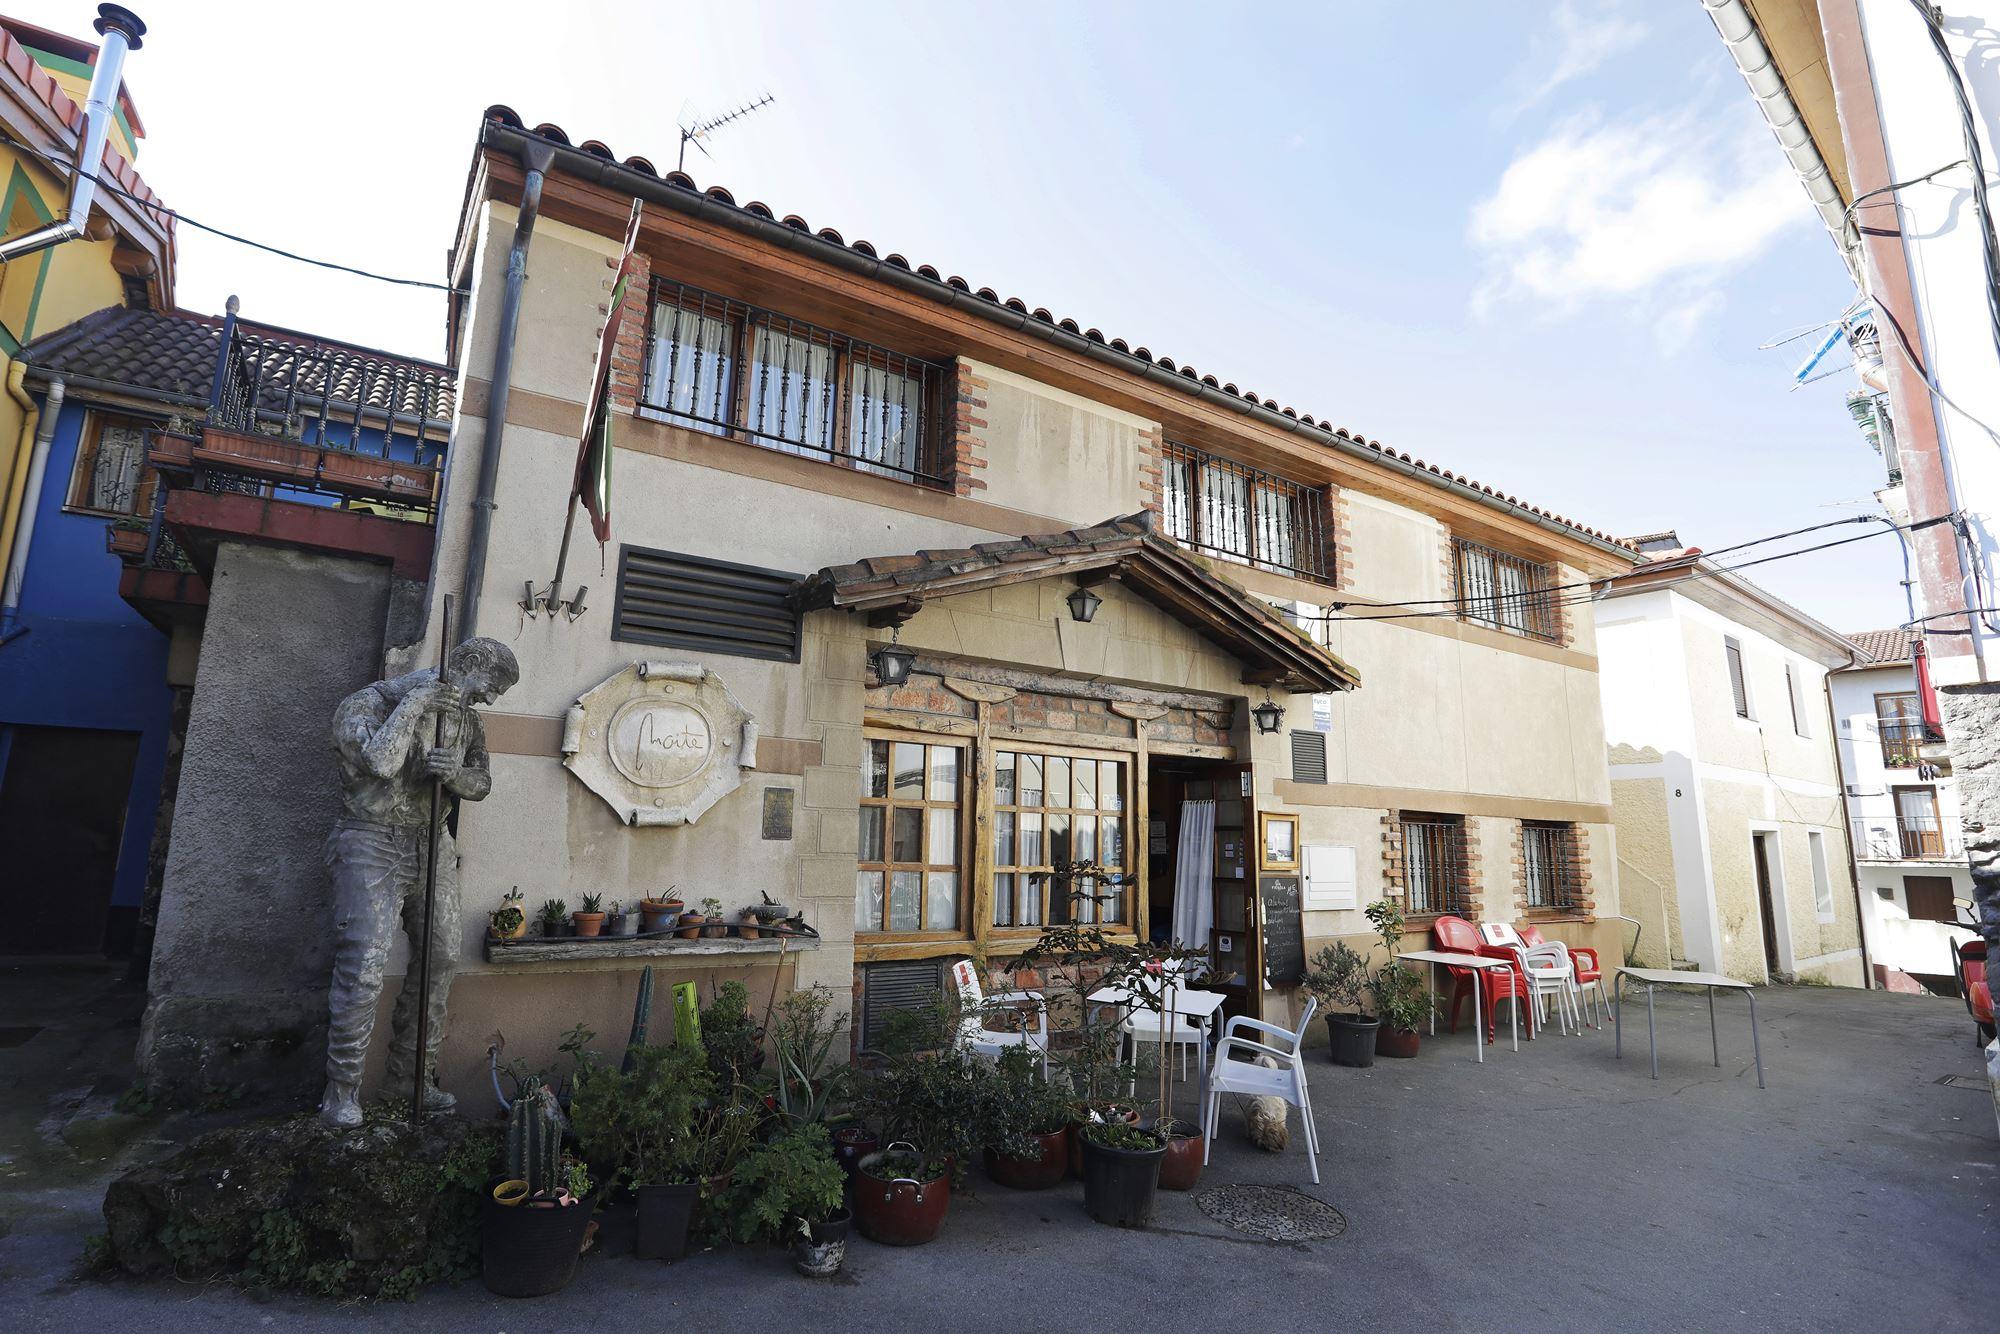 La fachada de 'Asador Maite', emblemático restaurante.